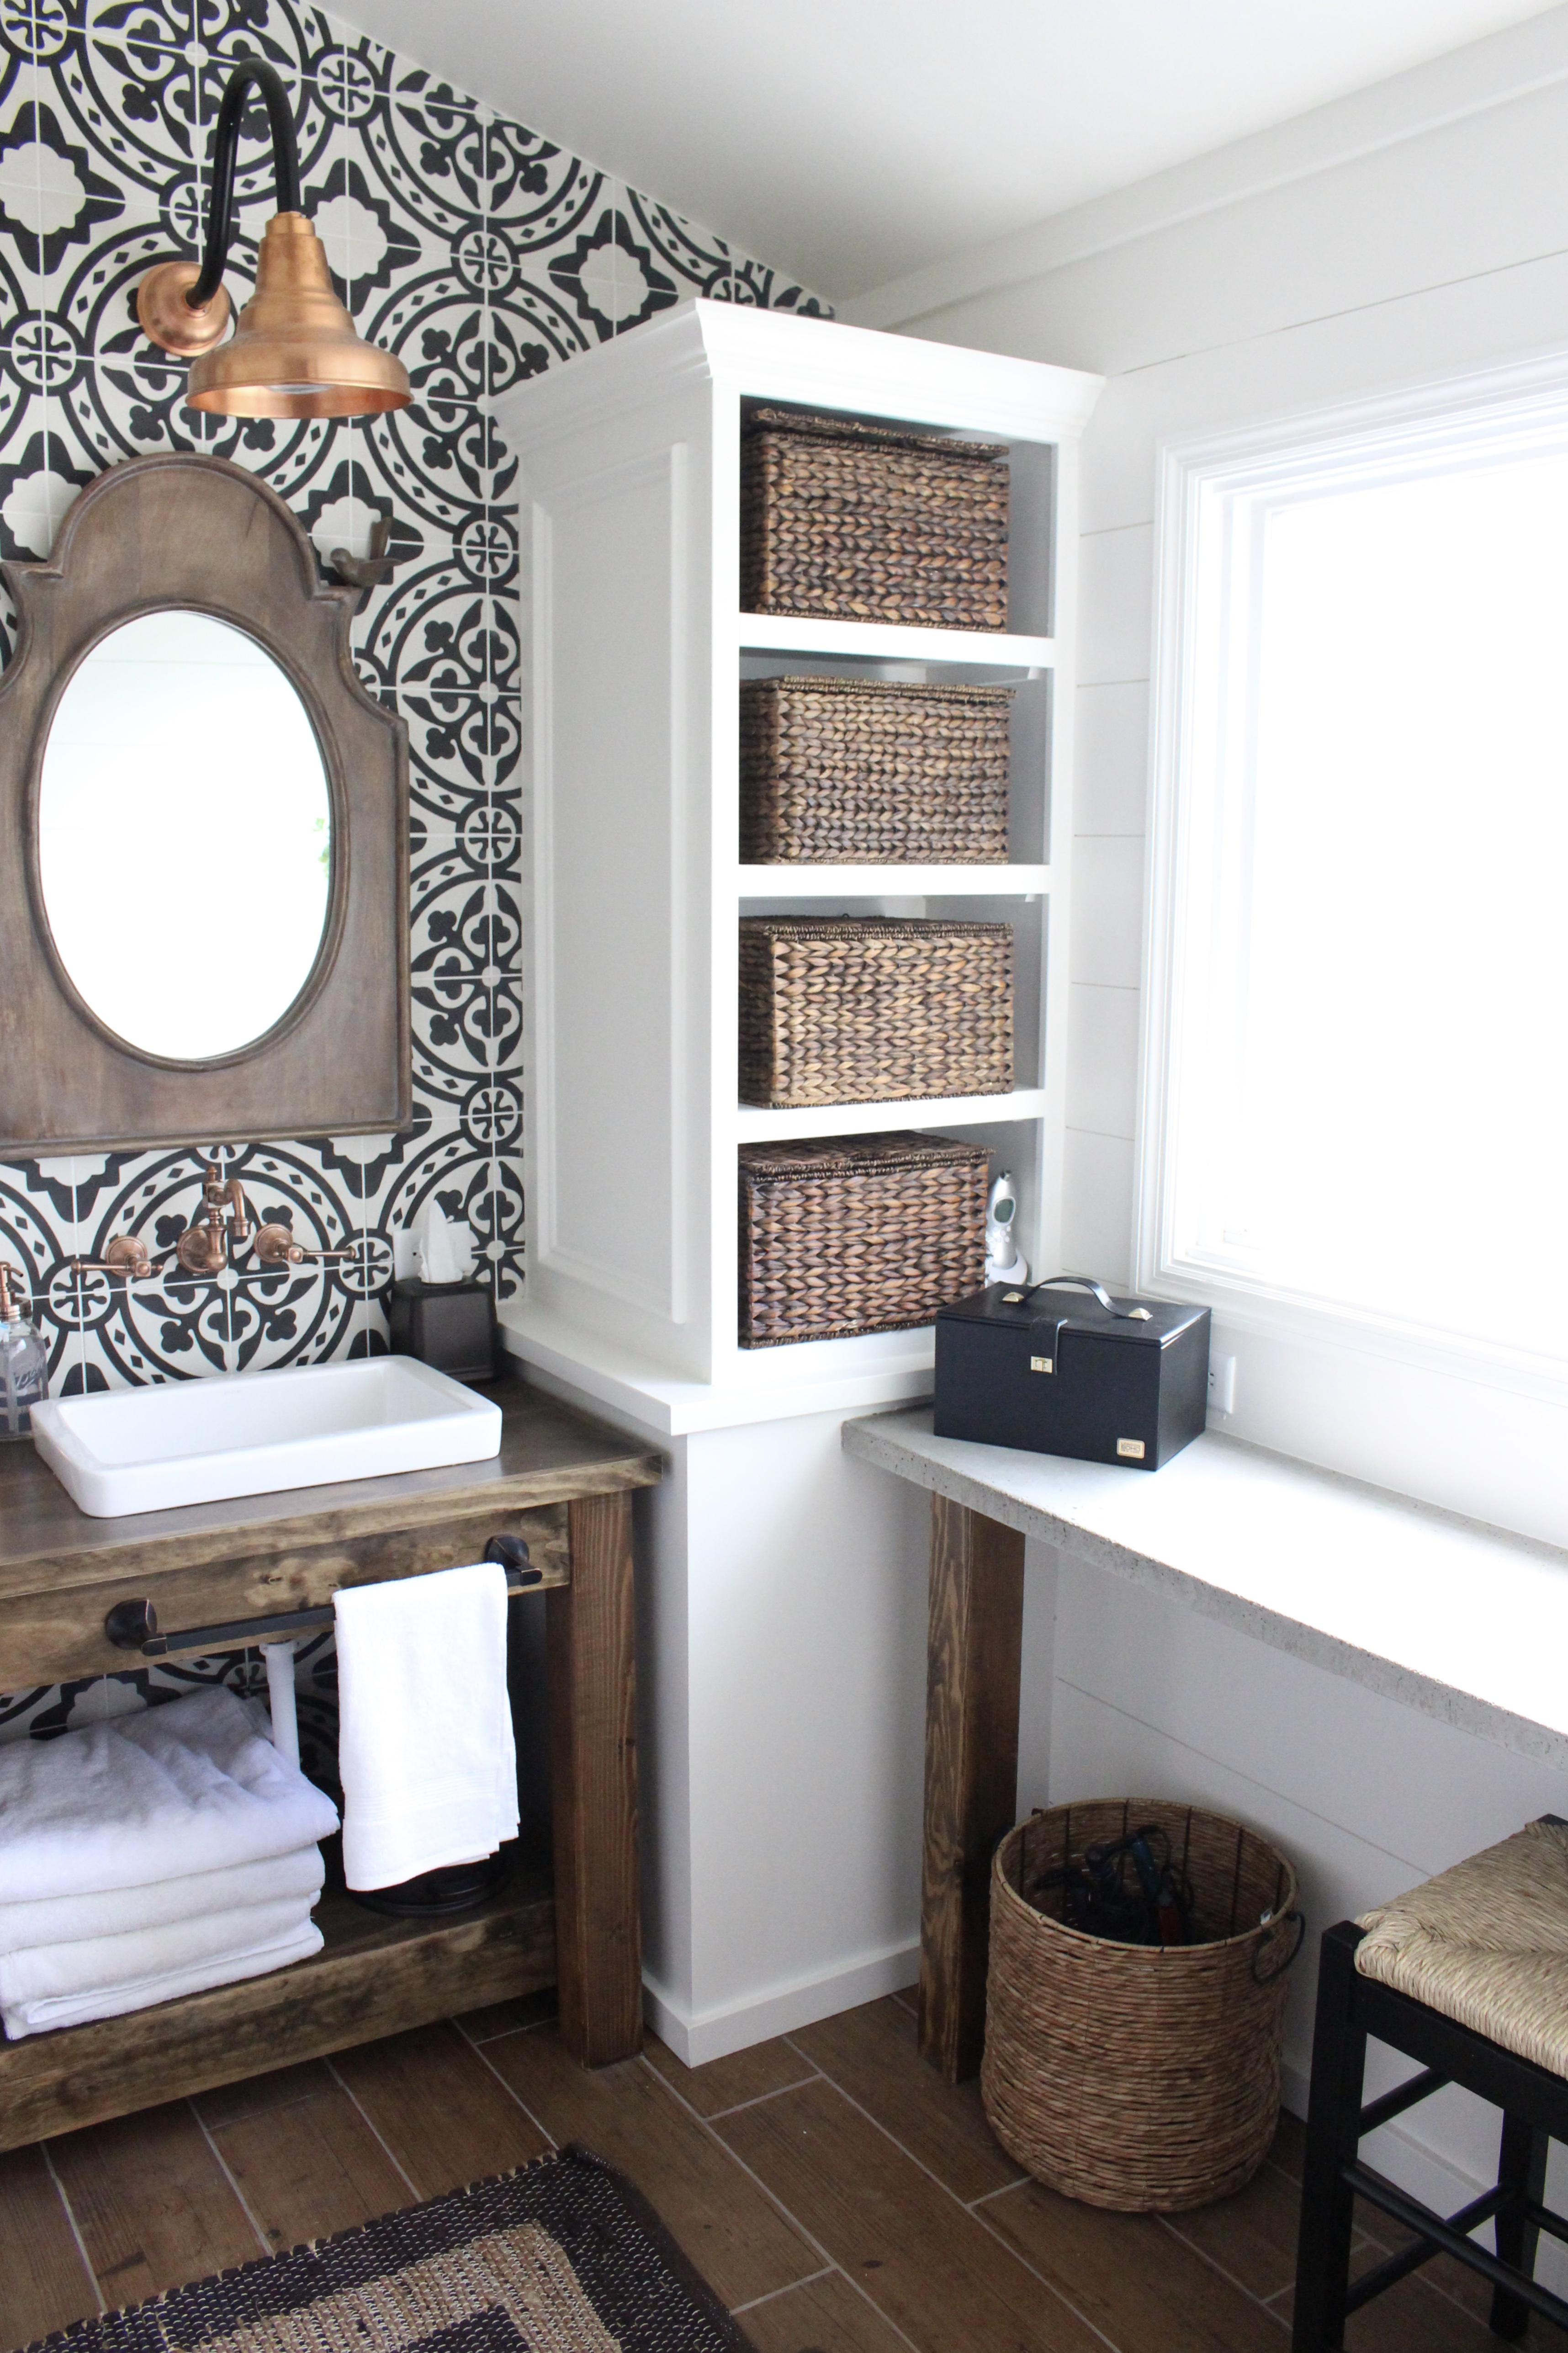 Modern Farmhouse Bathroom Remodel Reveal | White Cottage ... on Farmhouse Shower Ideas  id=16504